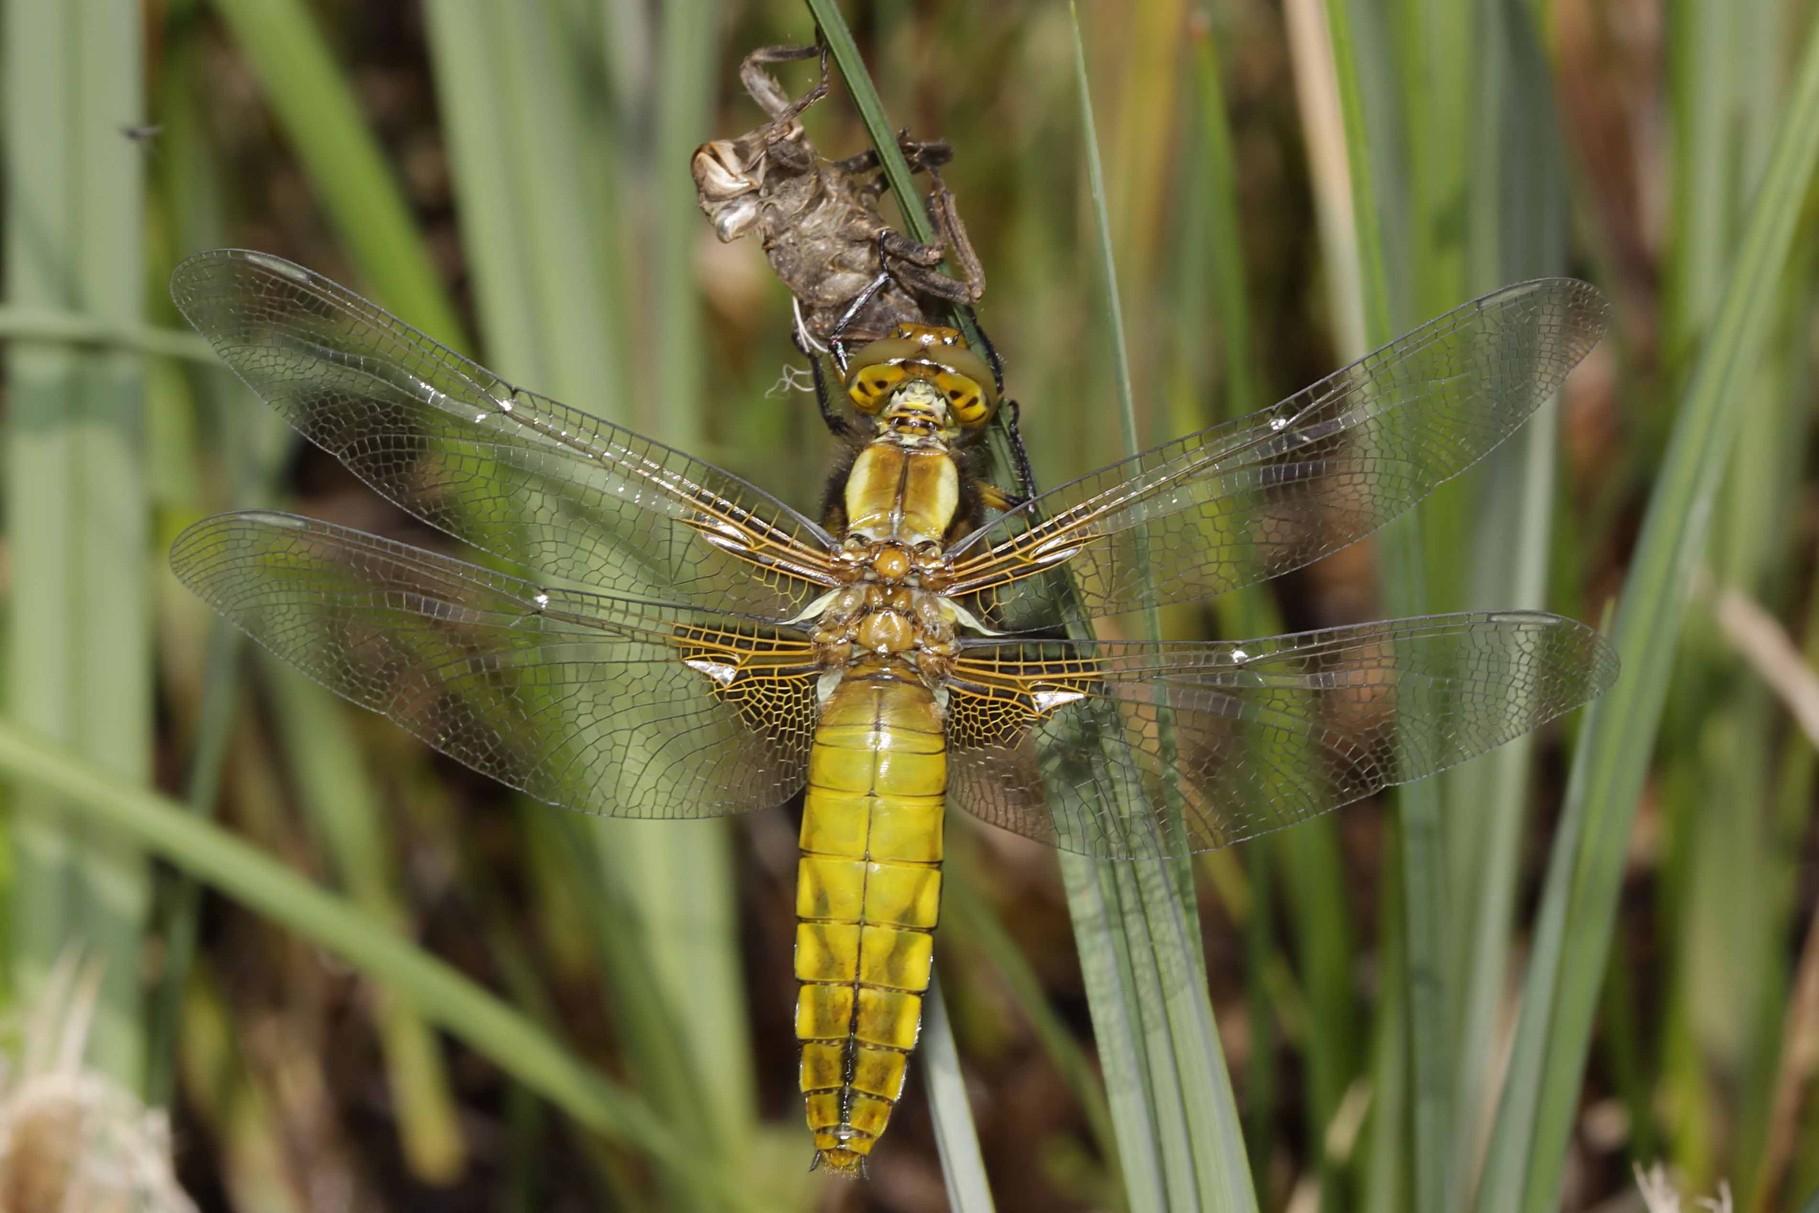 Plattbauch, Libellula depressa, Weibchen kurz vor dem Jungfernflug.